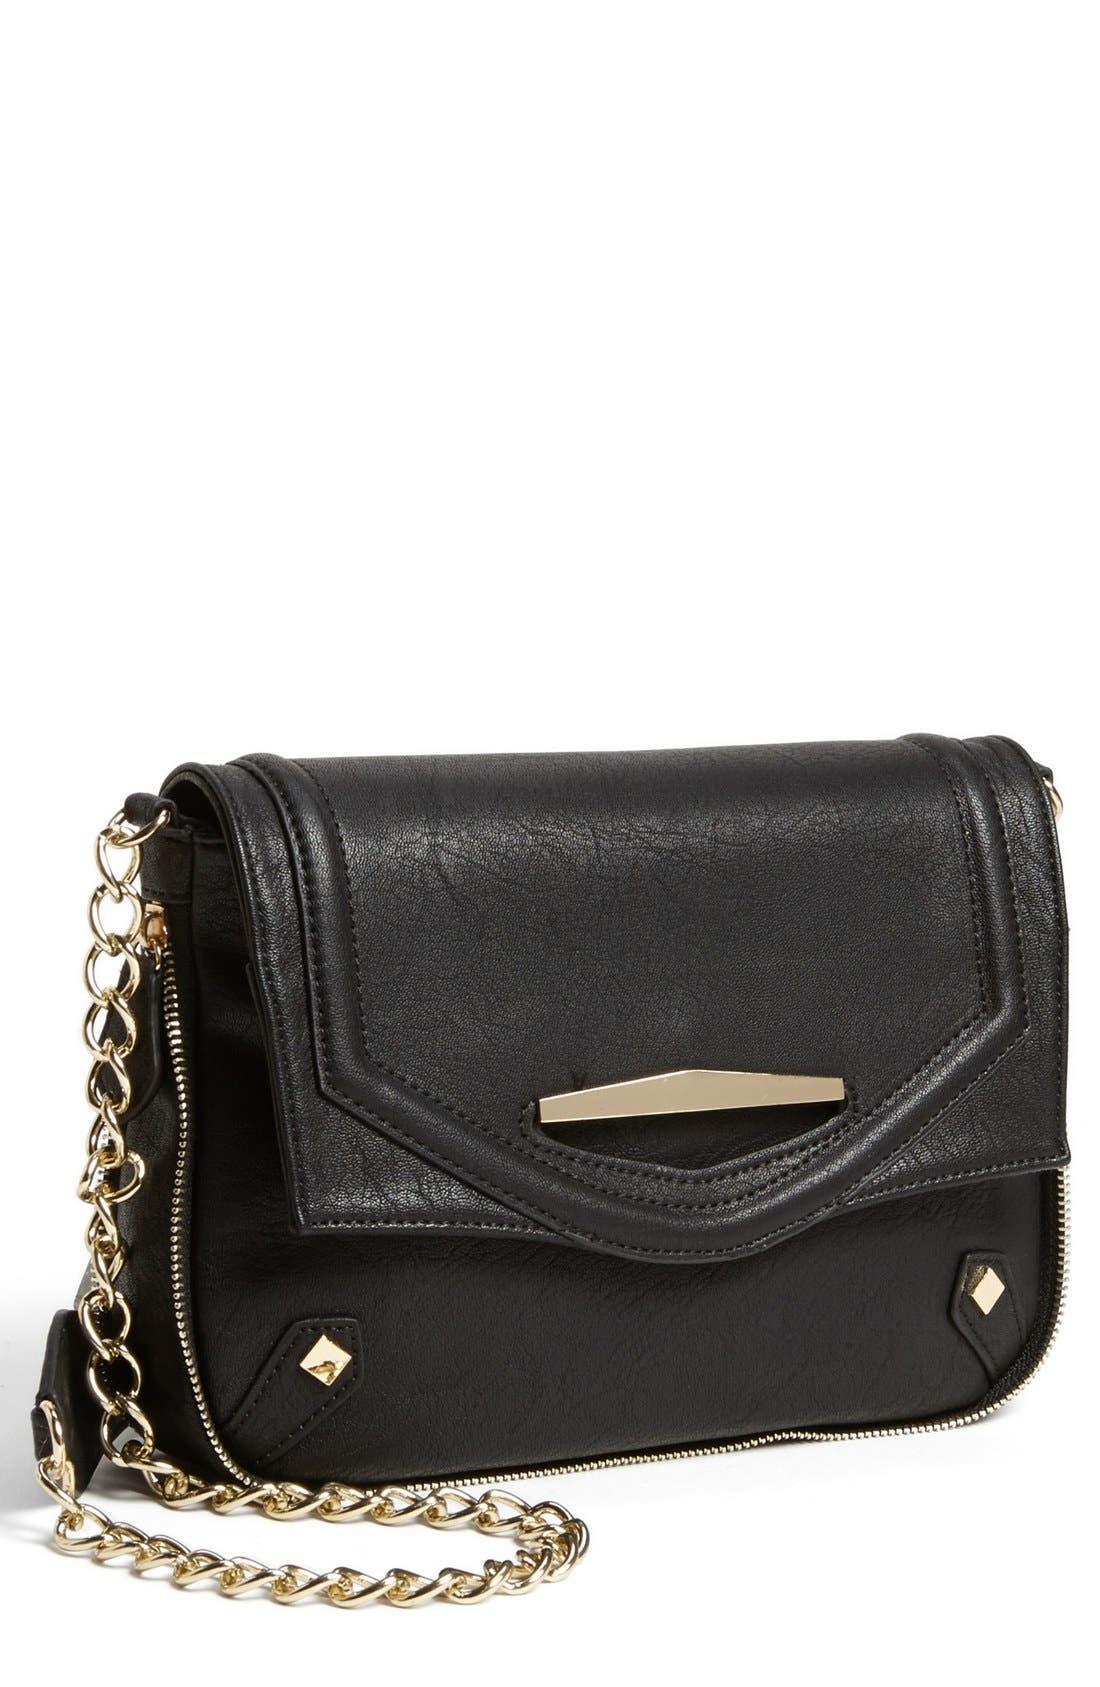 Alternate Image 1 Selected - Danielle Nicole 'Peyton' Shoulder Bag